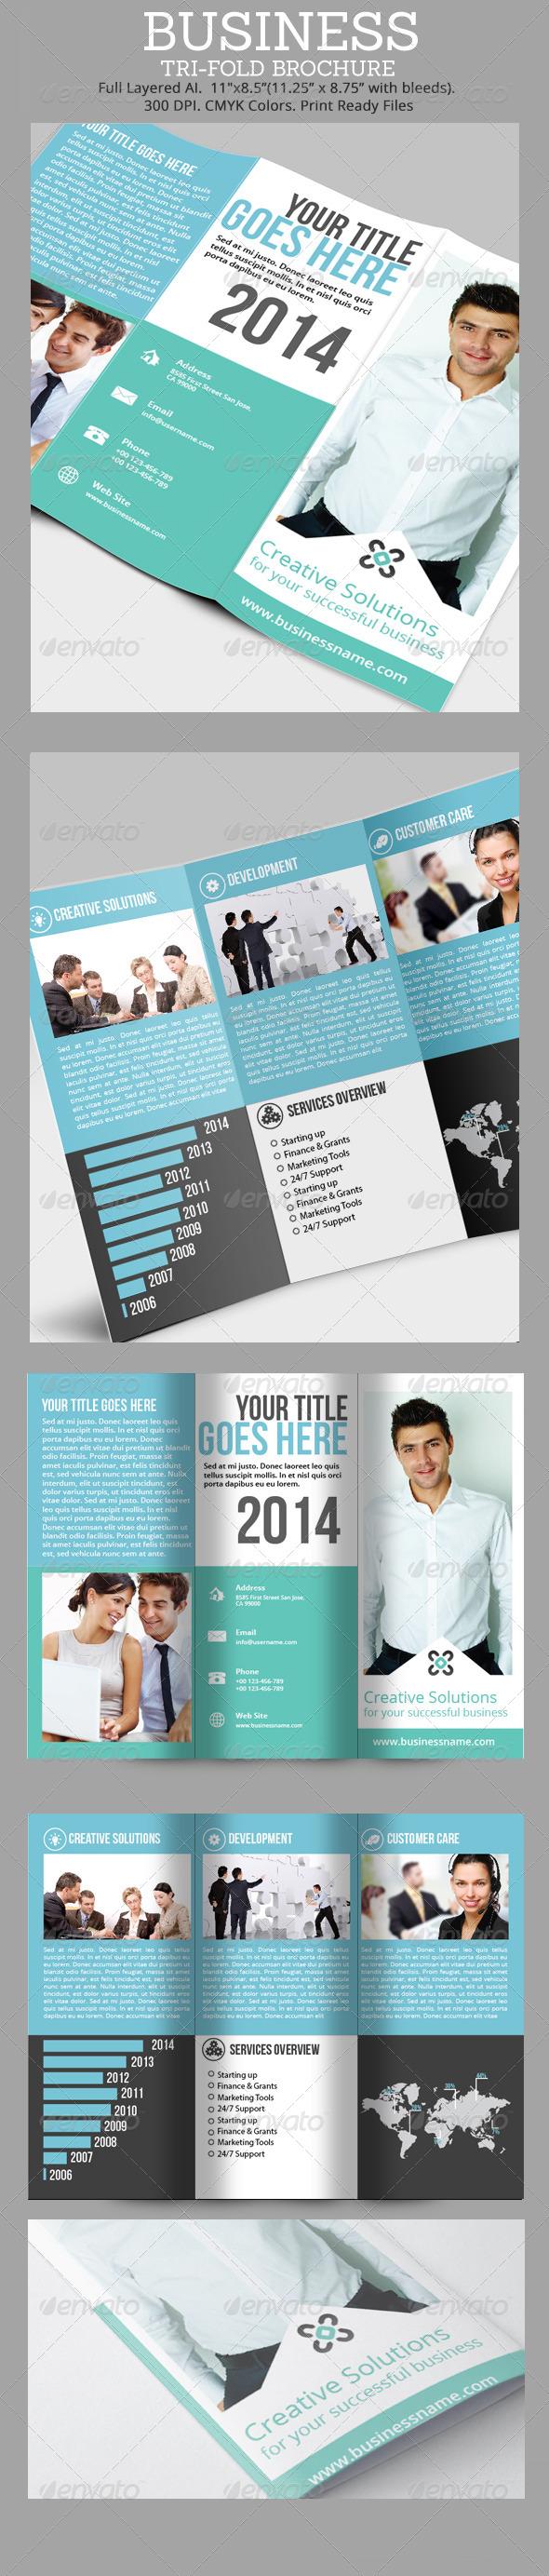 GraphicRiver Simple Business Tri-Fold Brochure 6913413